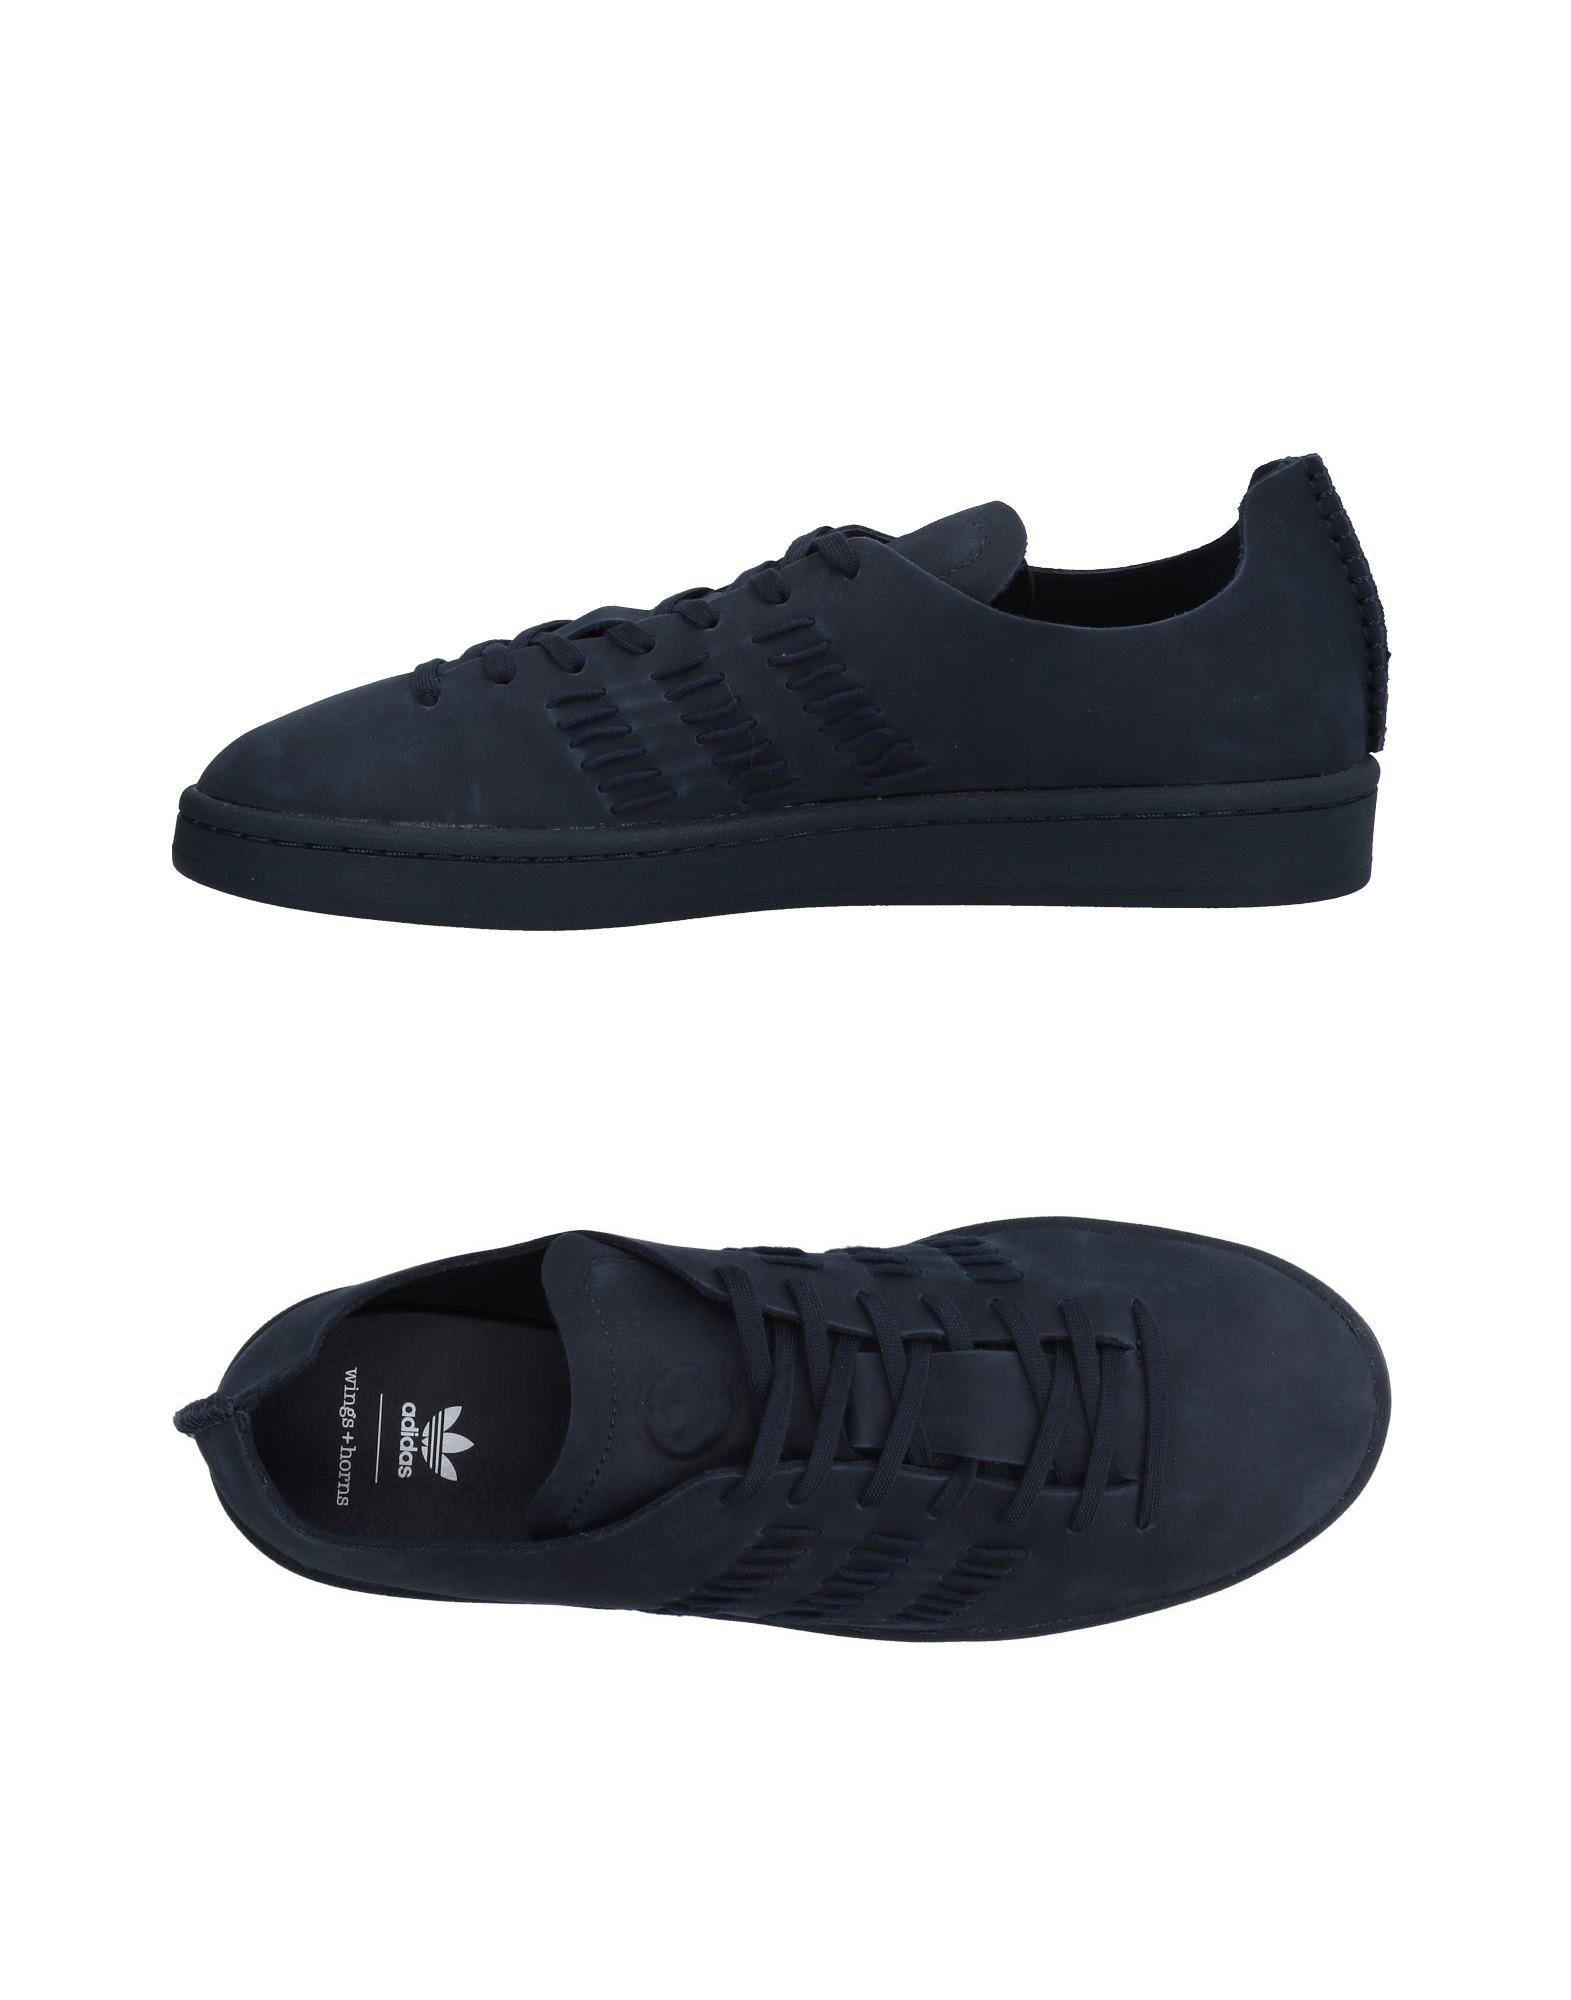 Sneakers Adidas Originals Uomo - 11521246XM